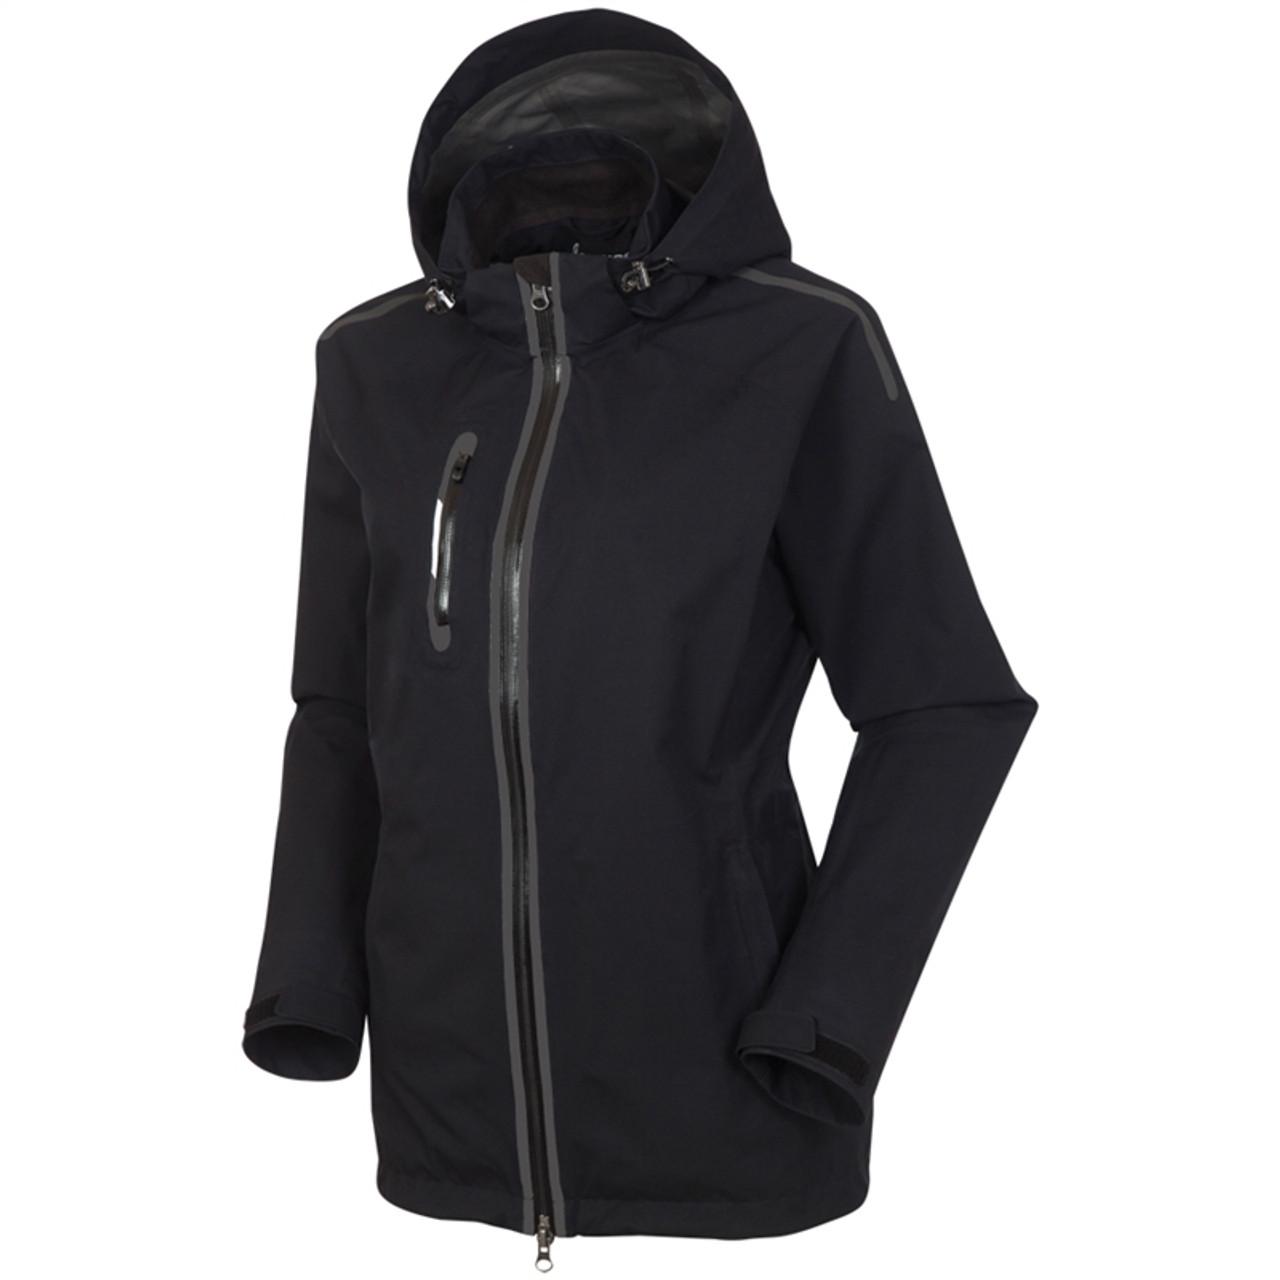 592a49c3c88b5 Sunice Kate GORE-TEX® Performance Jacket w  Removable Hood